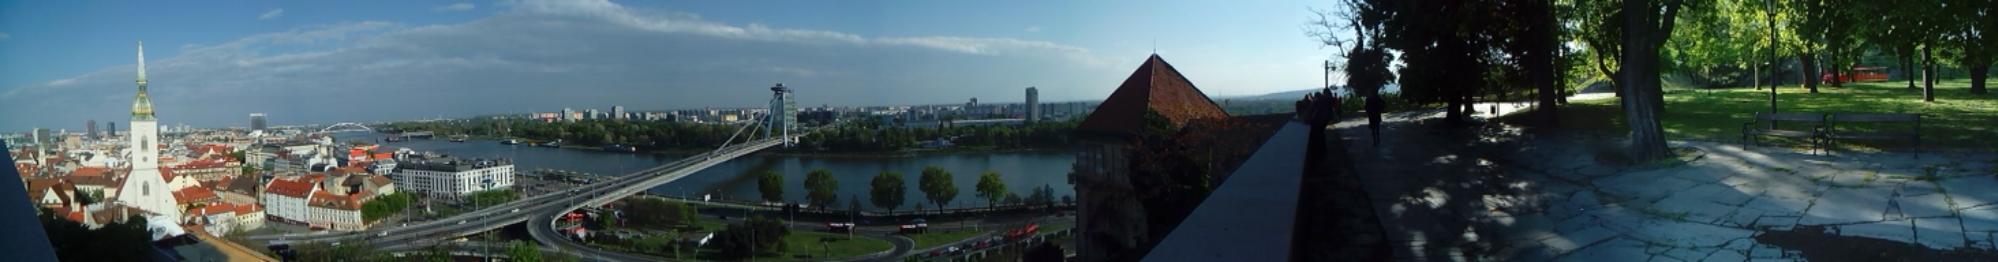 Panorámica de Bratislava - Eslovaquia